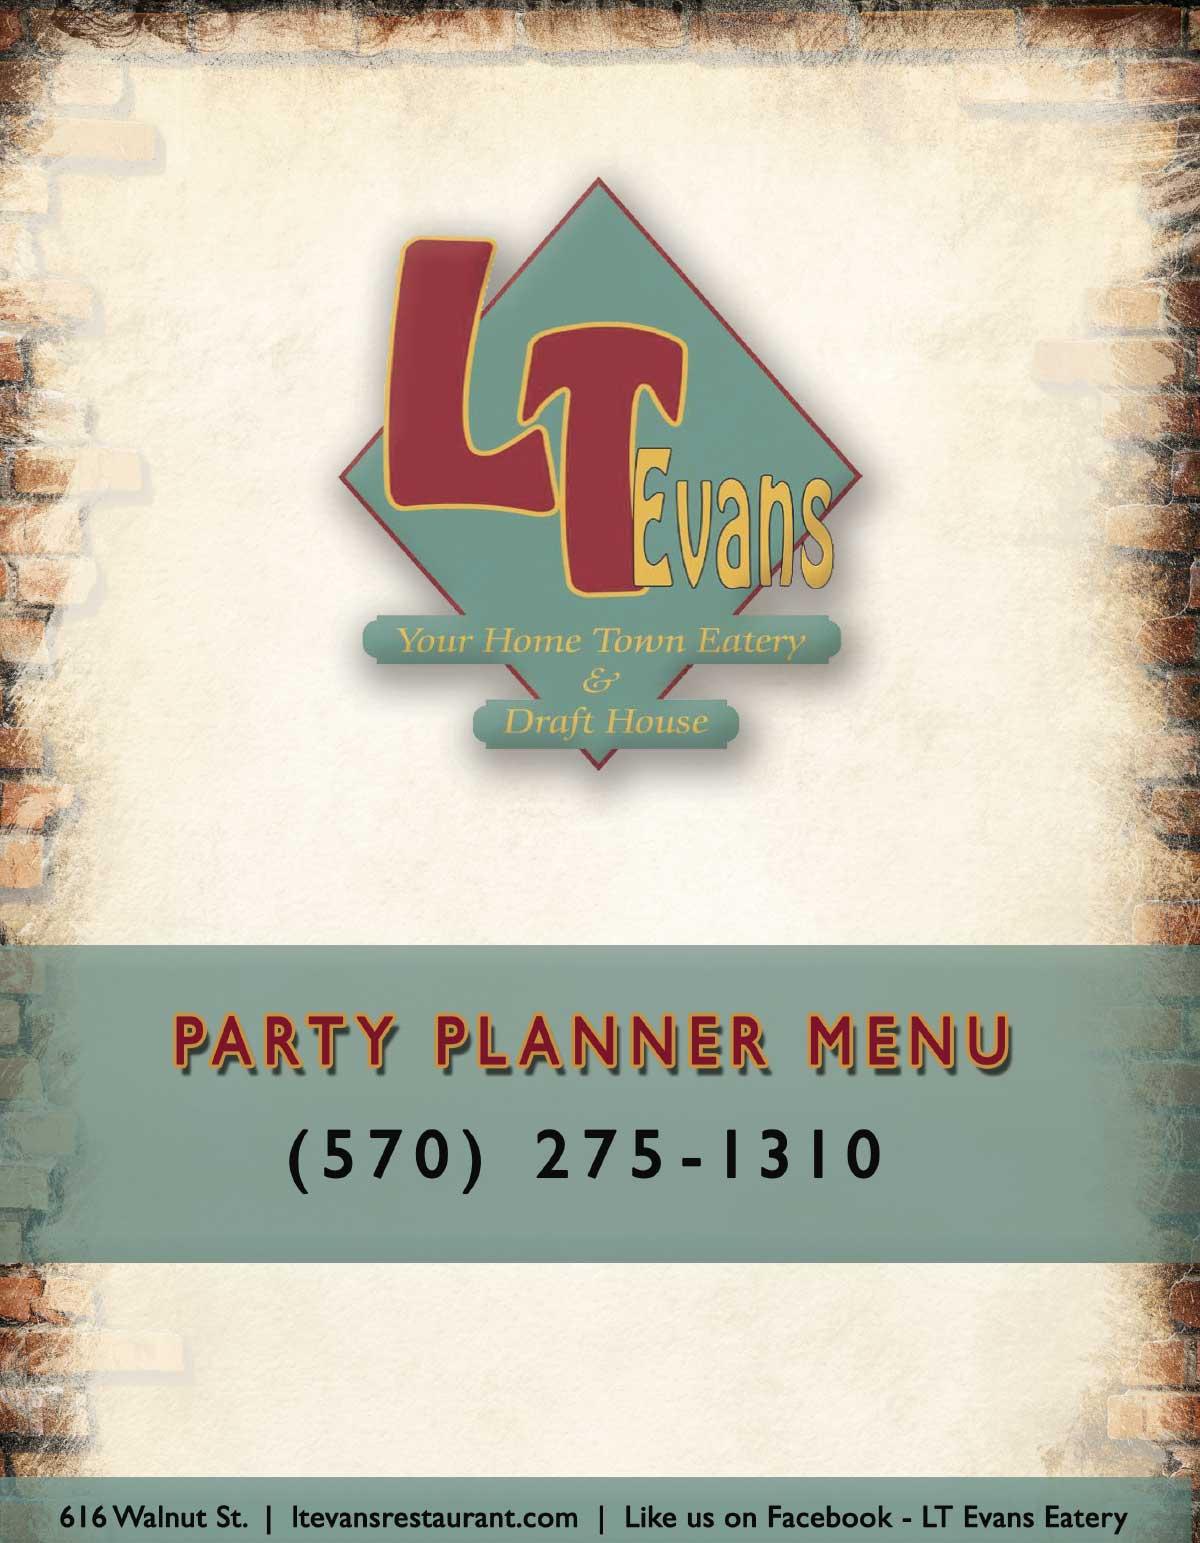 partyplanner.menu_.3.2018-1